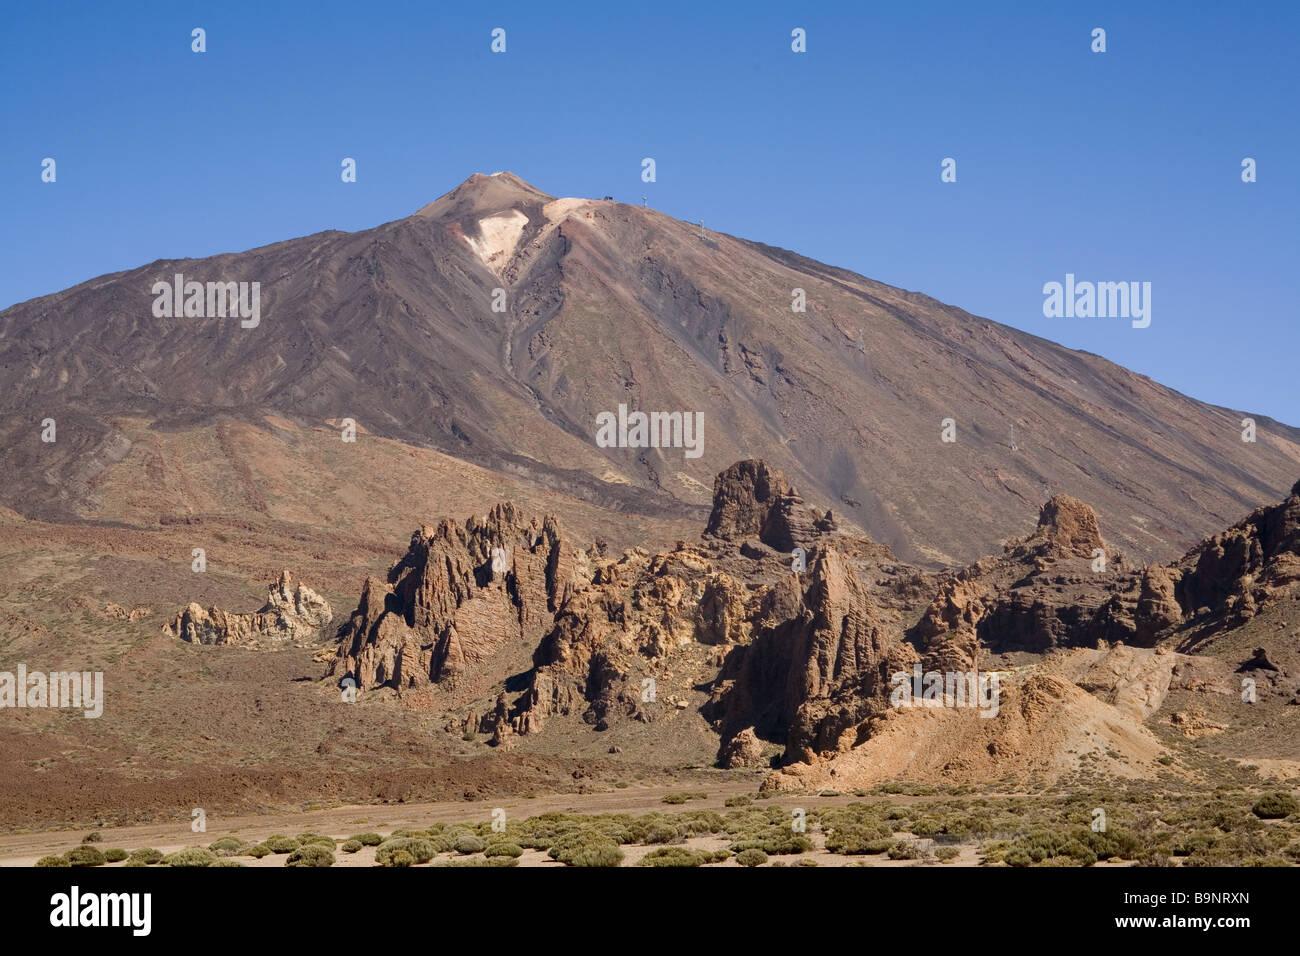 Spain Canary Islands Tenerife Llano de Ucana & Mount Teide - Stock Image